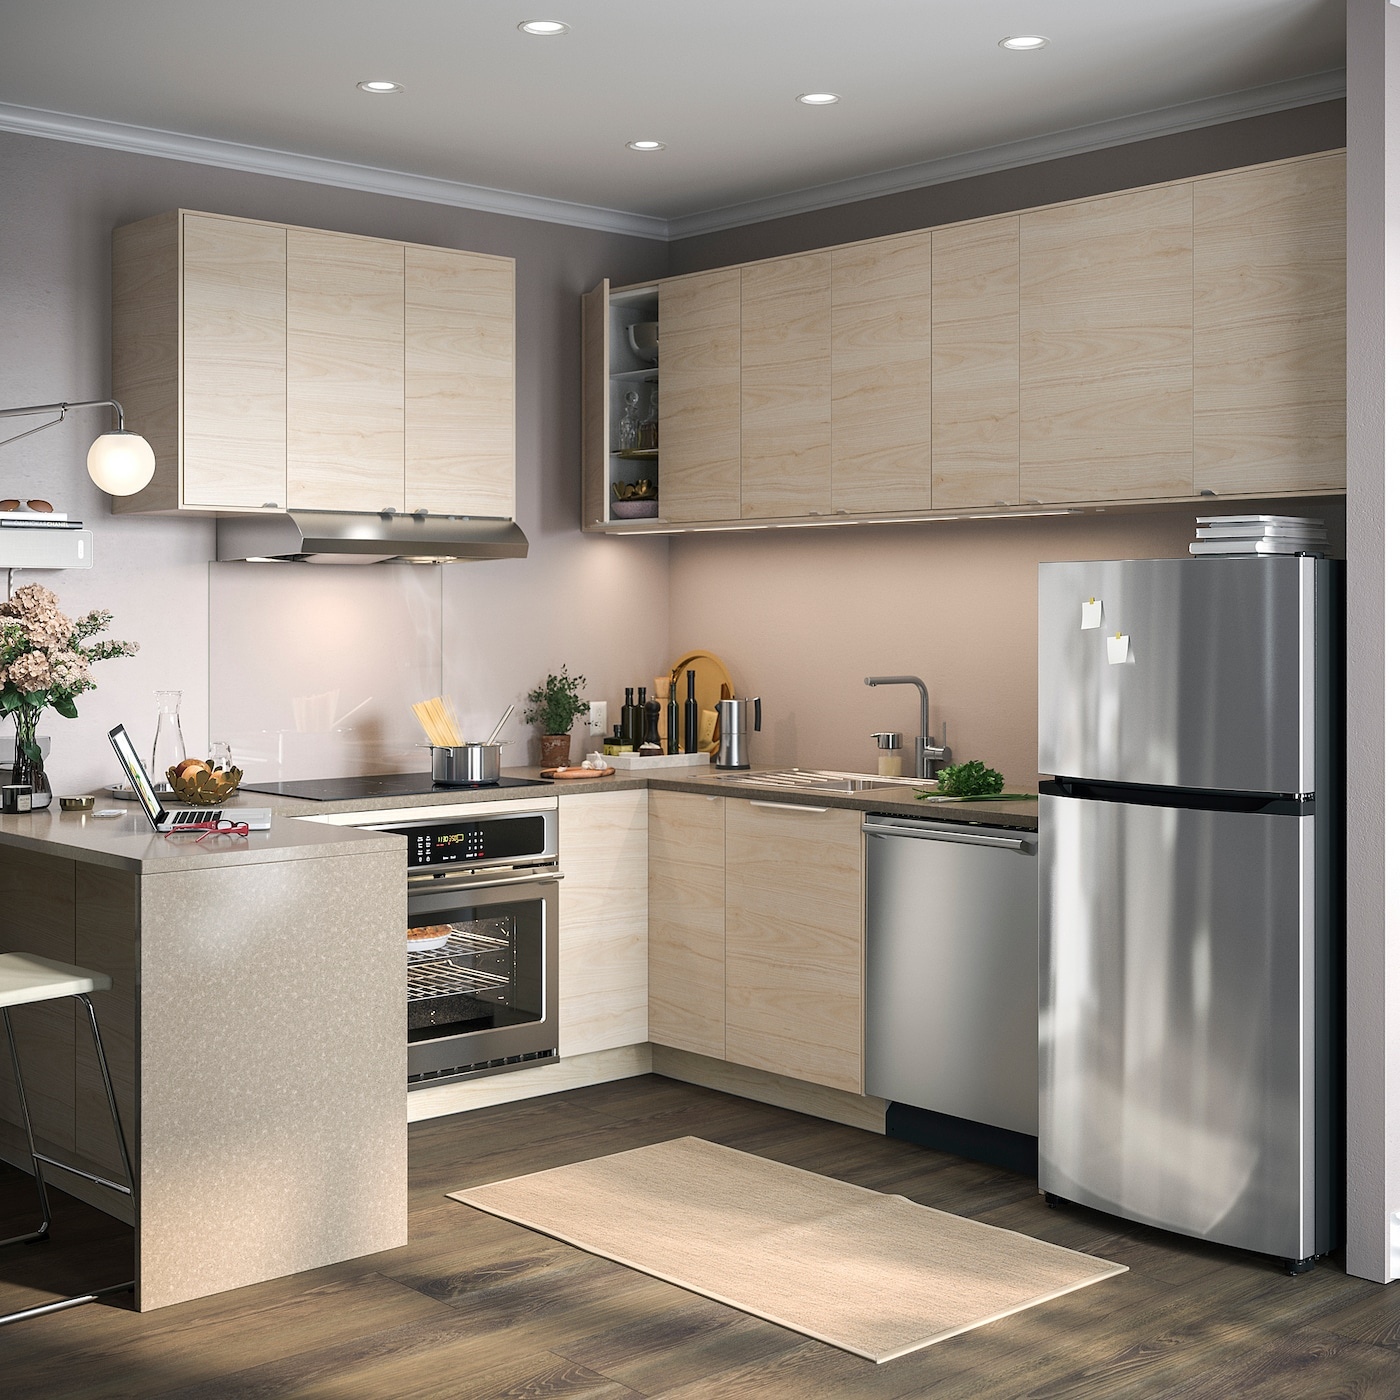 GENOMDRIVA Under cabinet range hood - Stainless steel